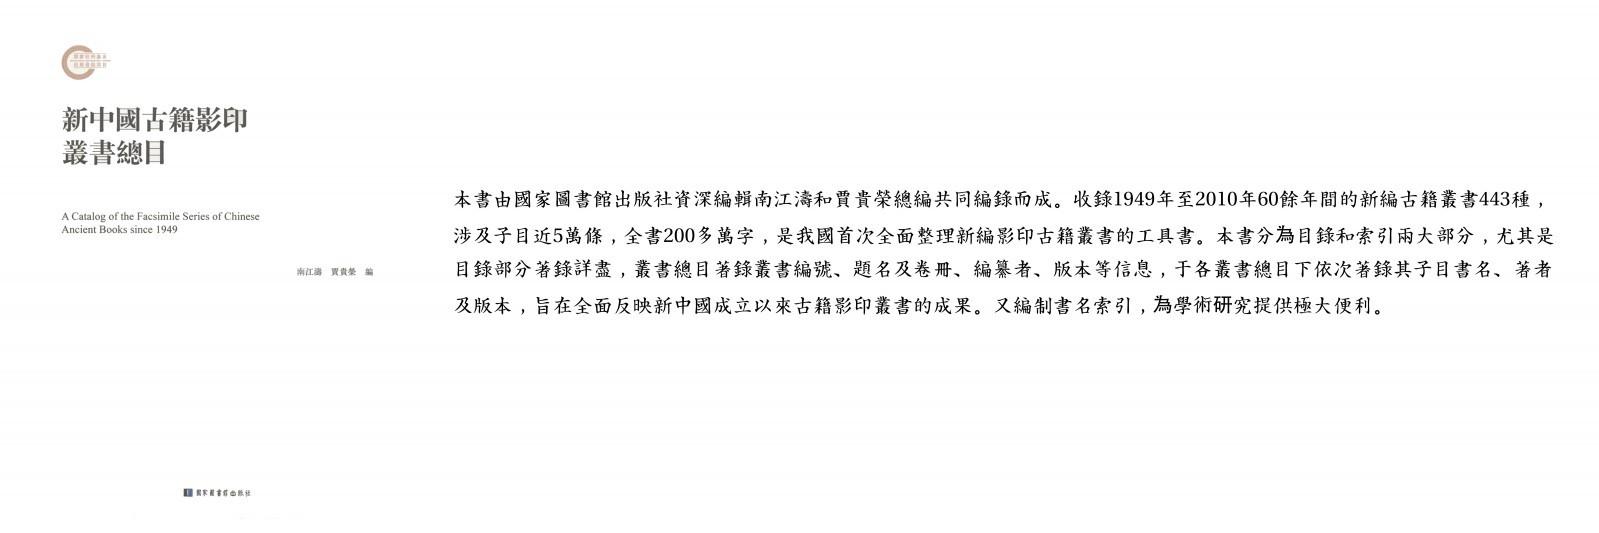 http://book.kongfz.com/261459/1110760619/